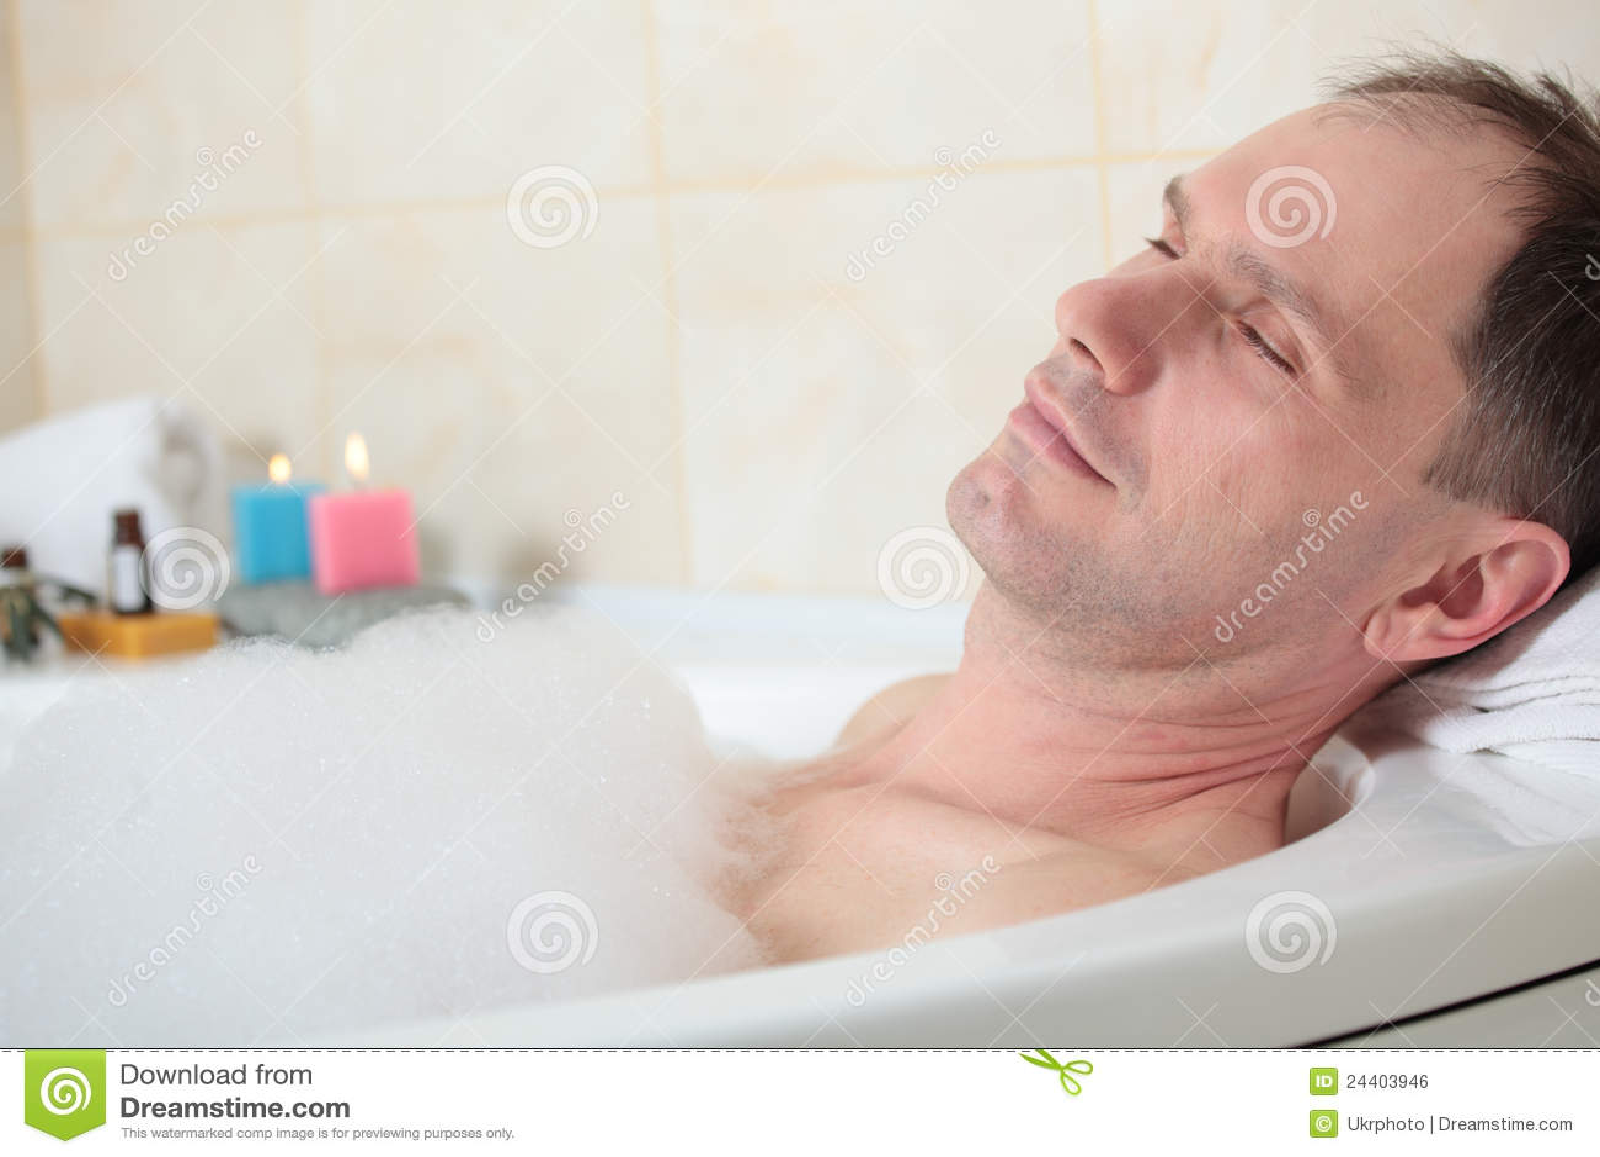 Man having a bath stock photo image of bathroom caucasian 24403946 - Image of bath room ...